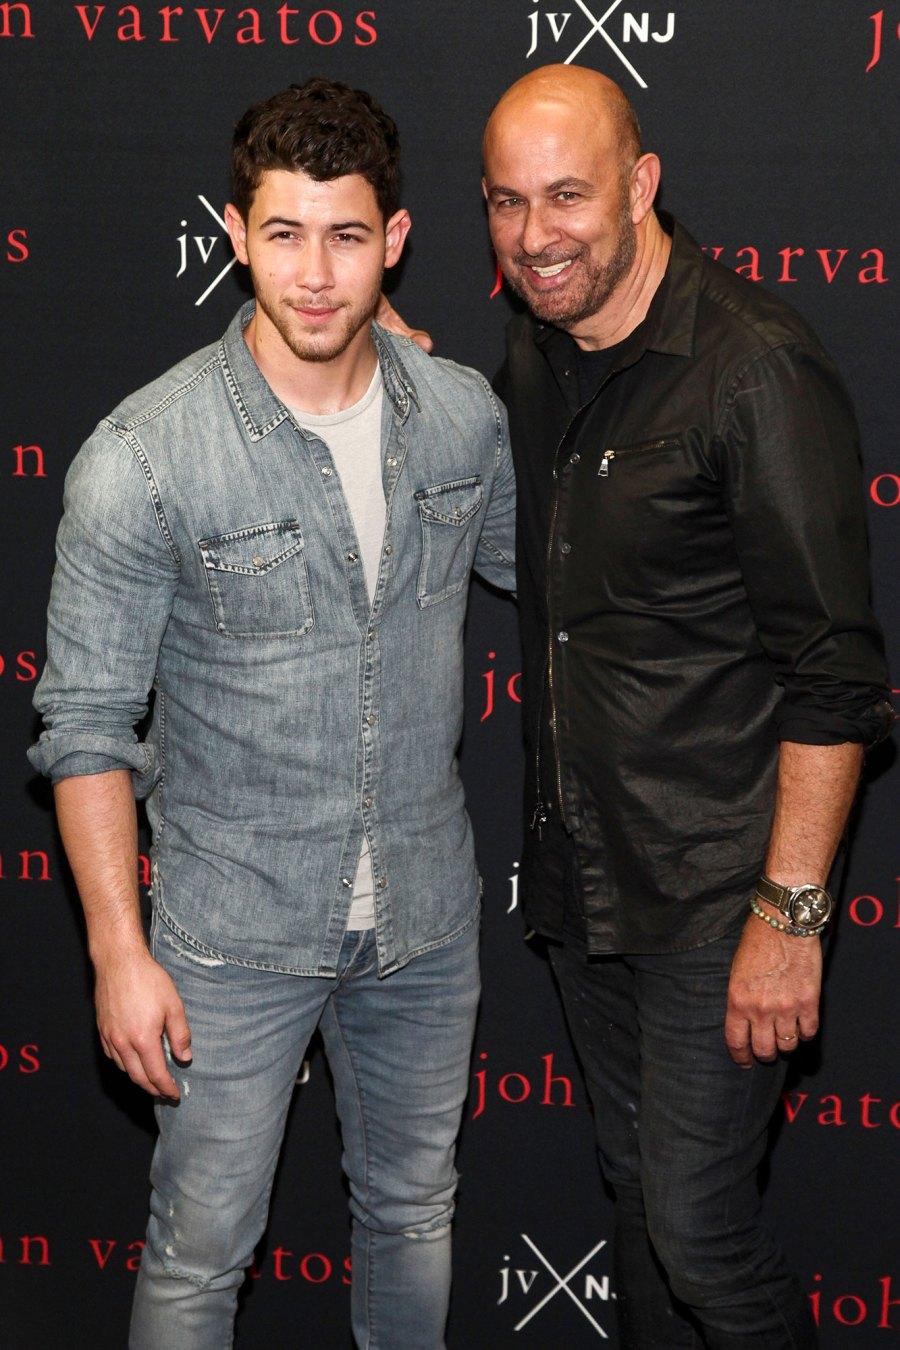 Nick Jonas and John Varvatos Launched Liquor Lines Together